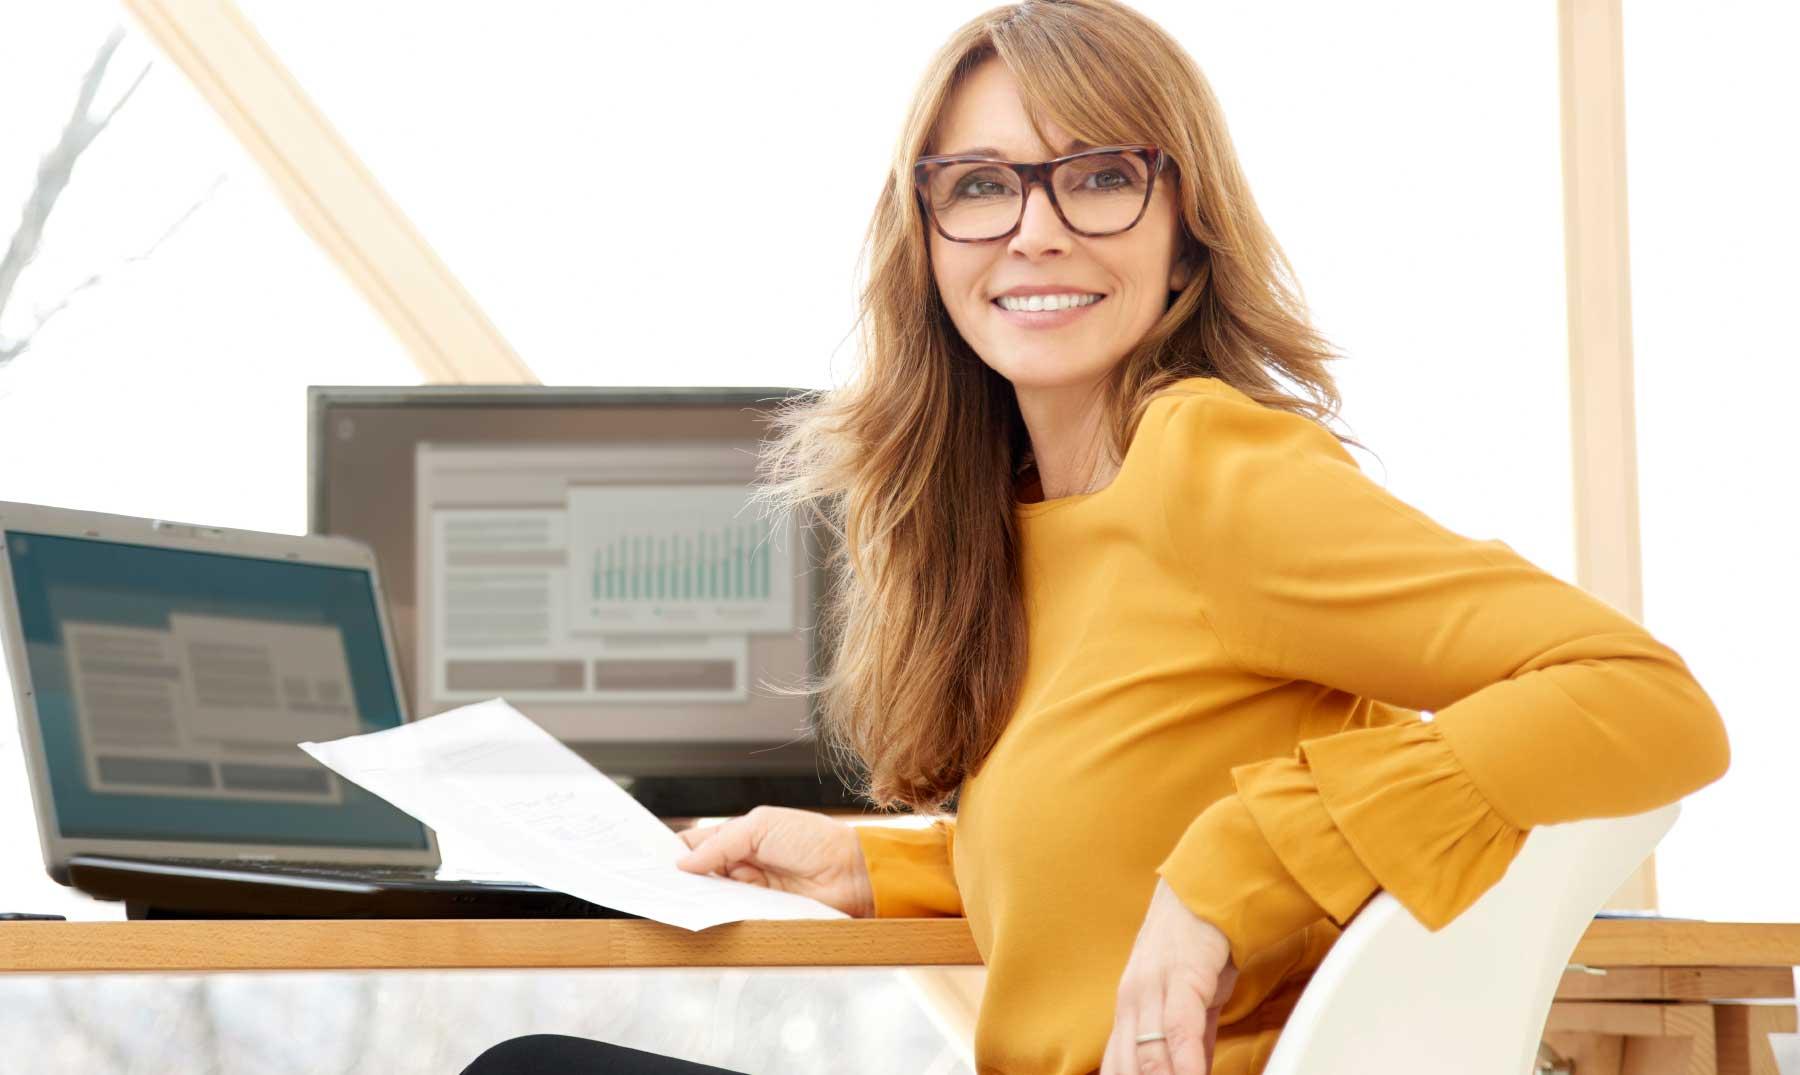 mujer-emprendedora-sonriendo